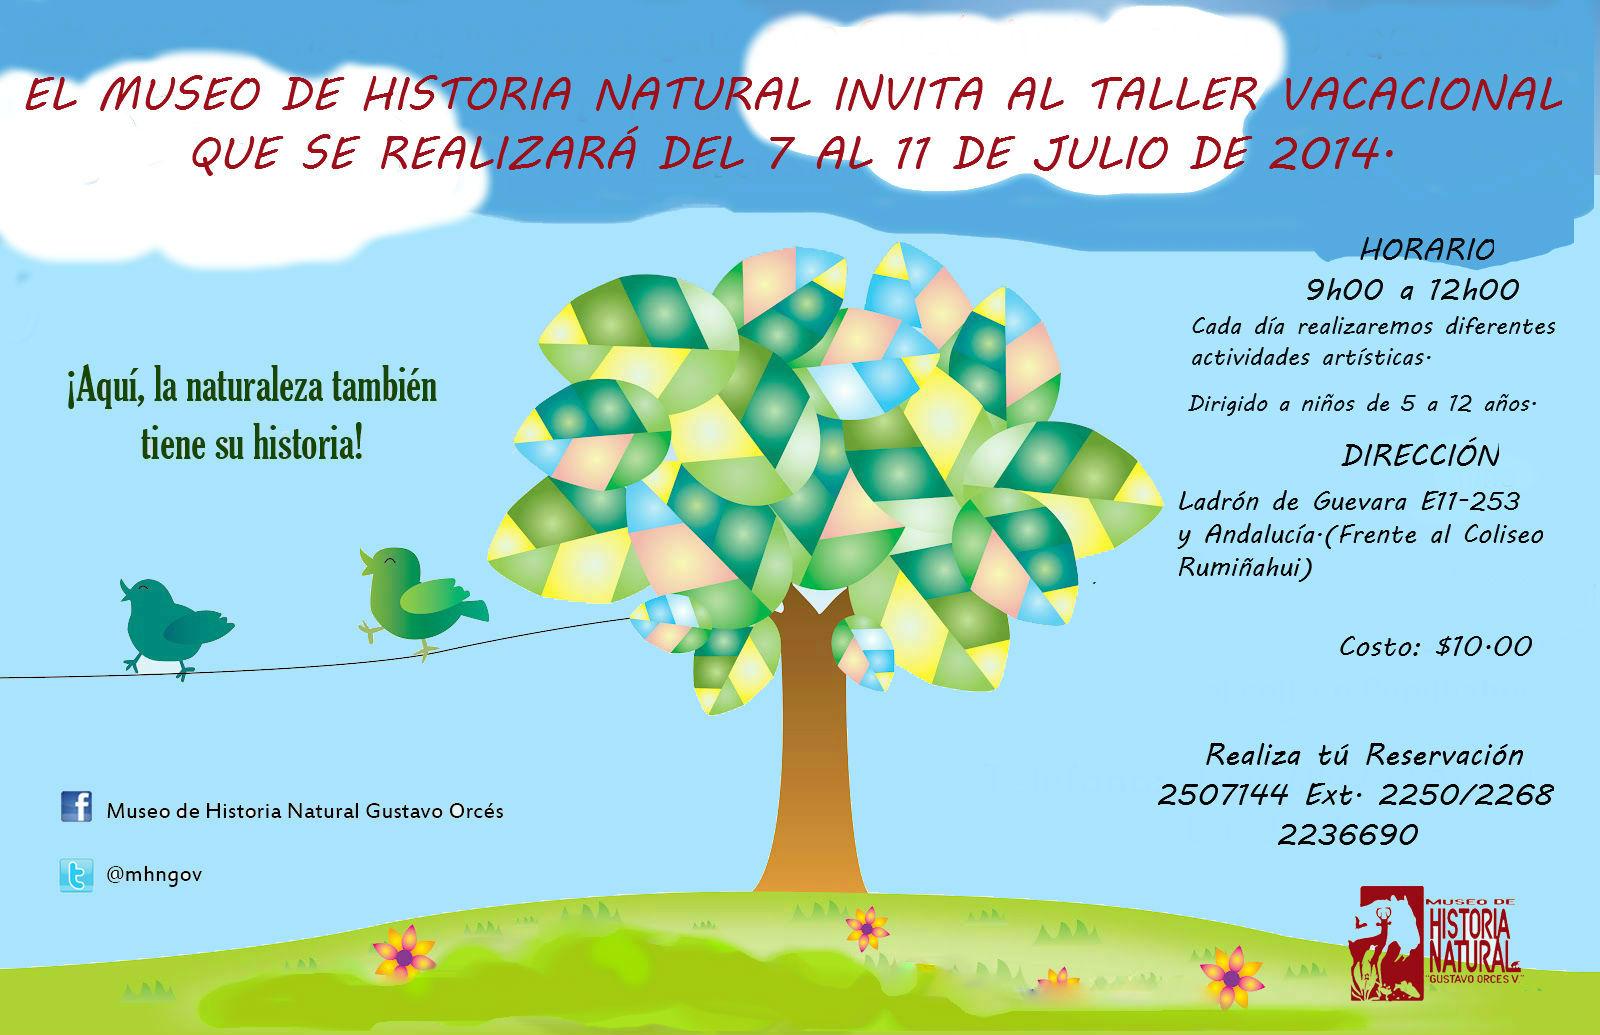 Taller_vacacional_2014